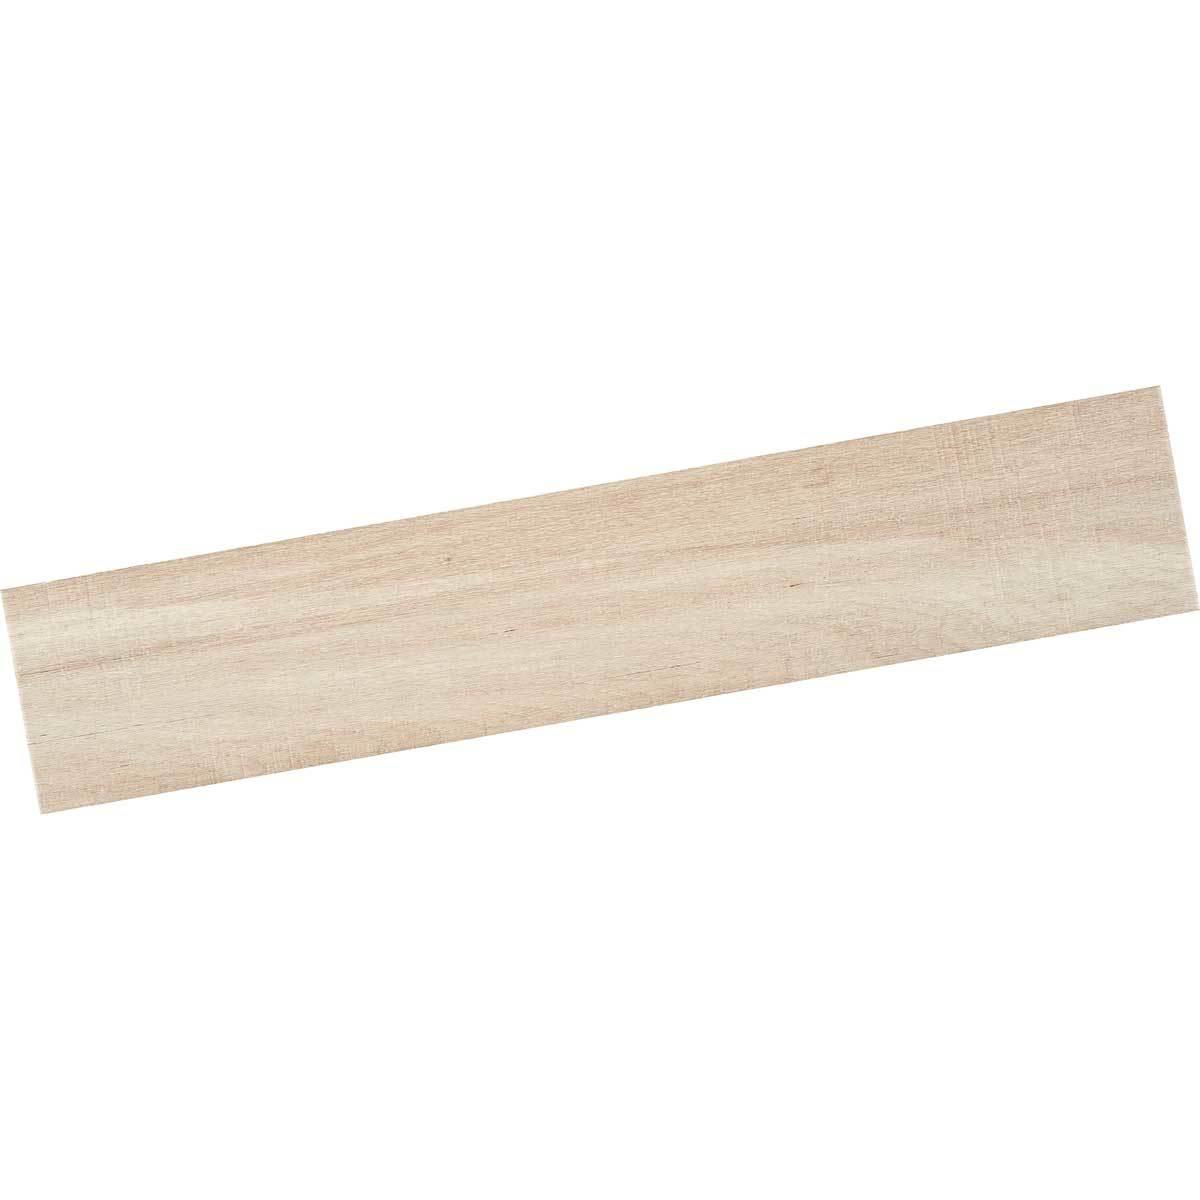 Mykonos Bluebell Blanco 230x1200 - Плитка базовая